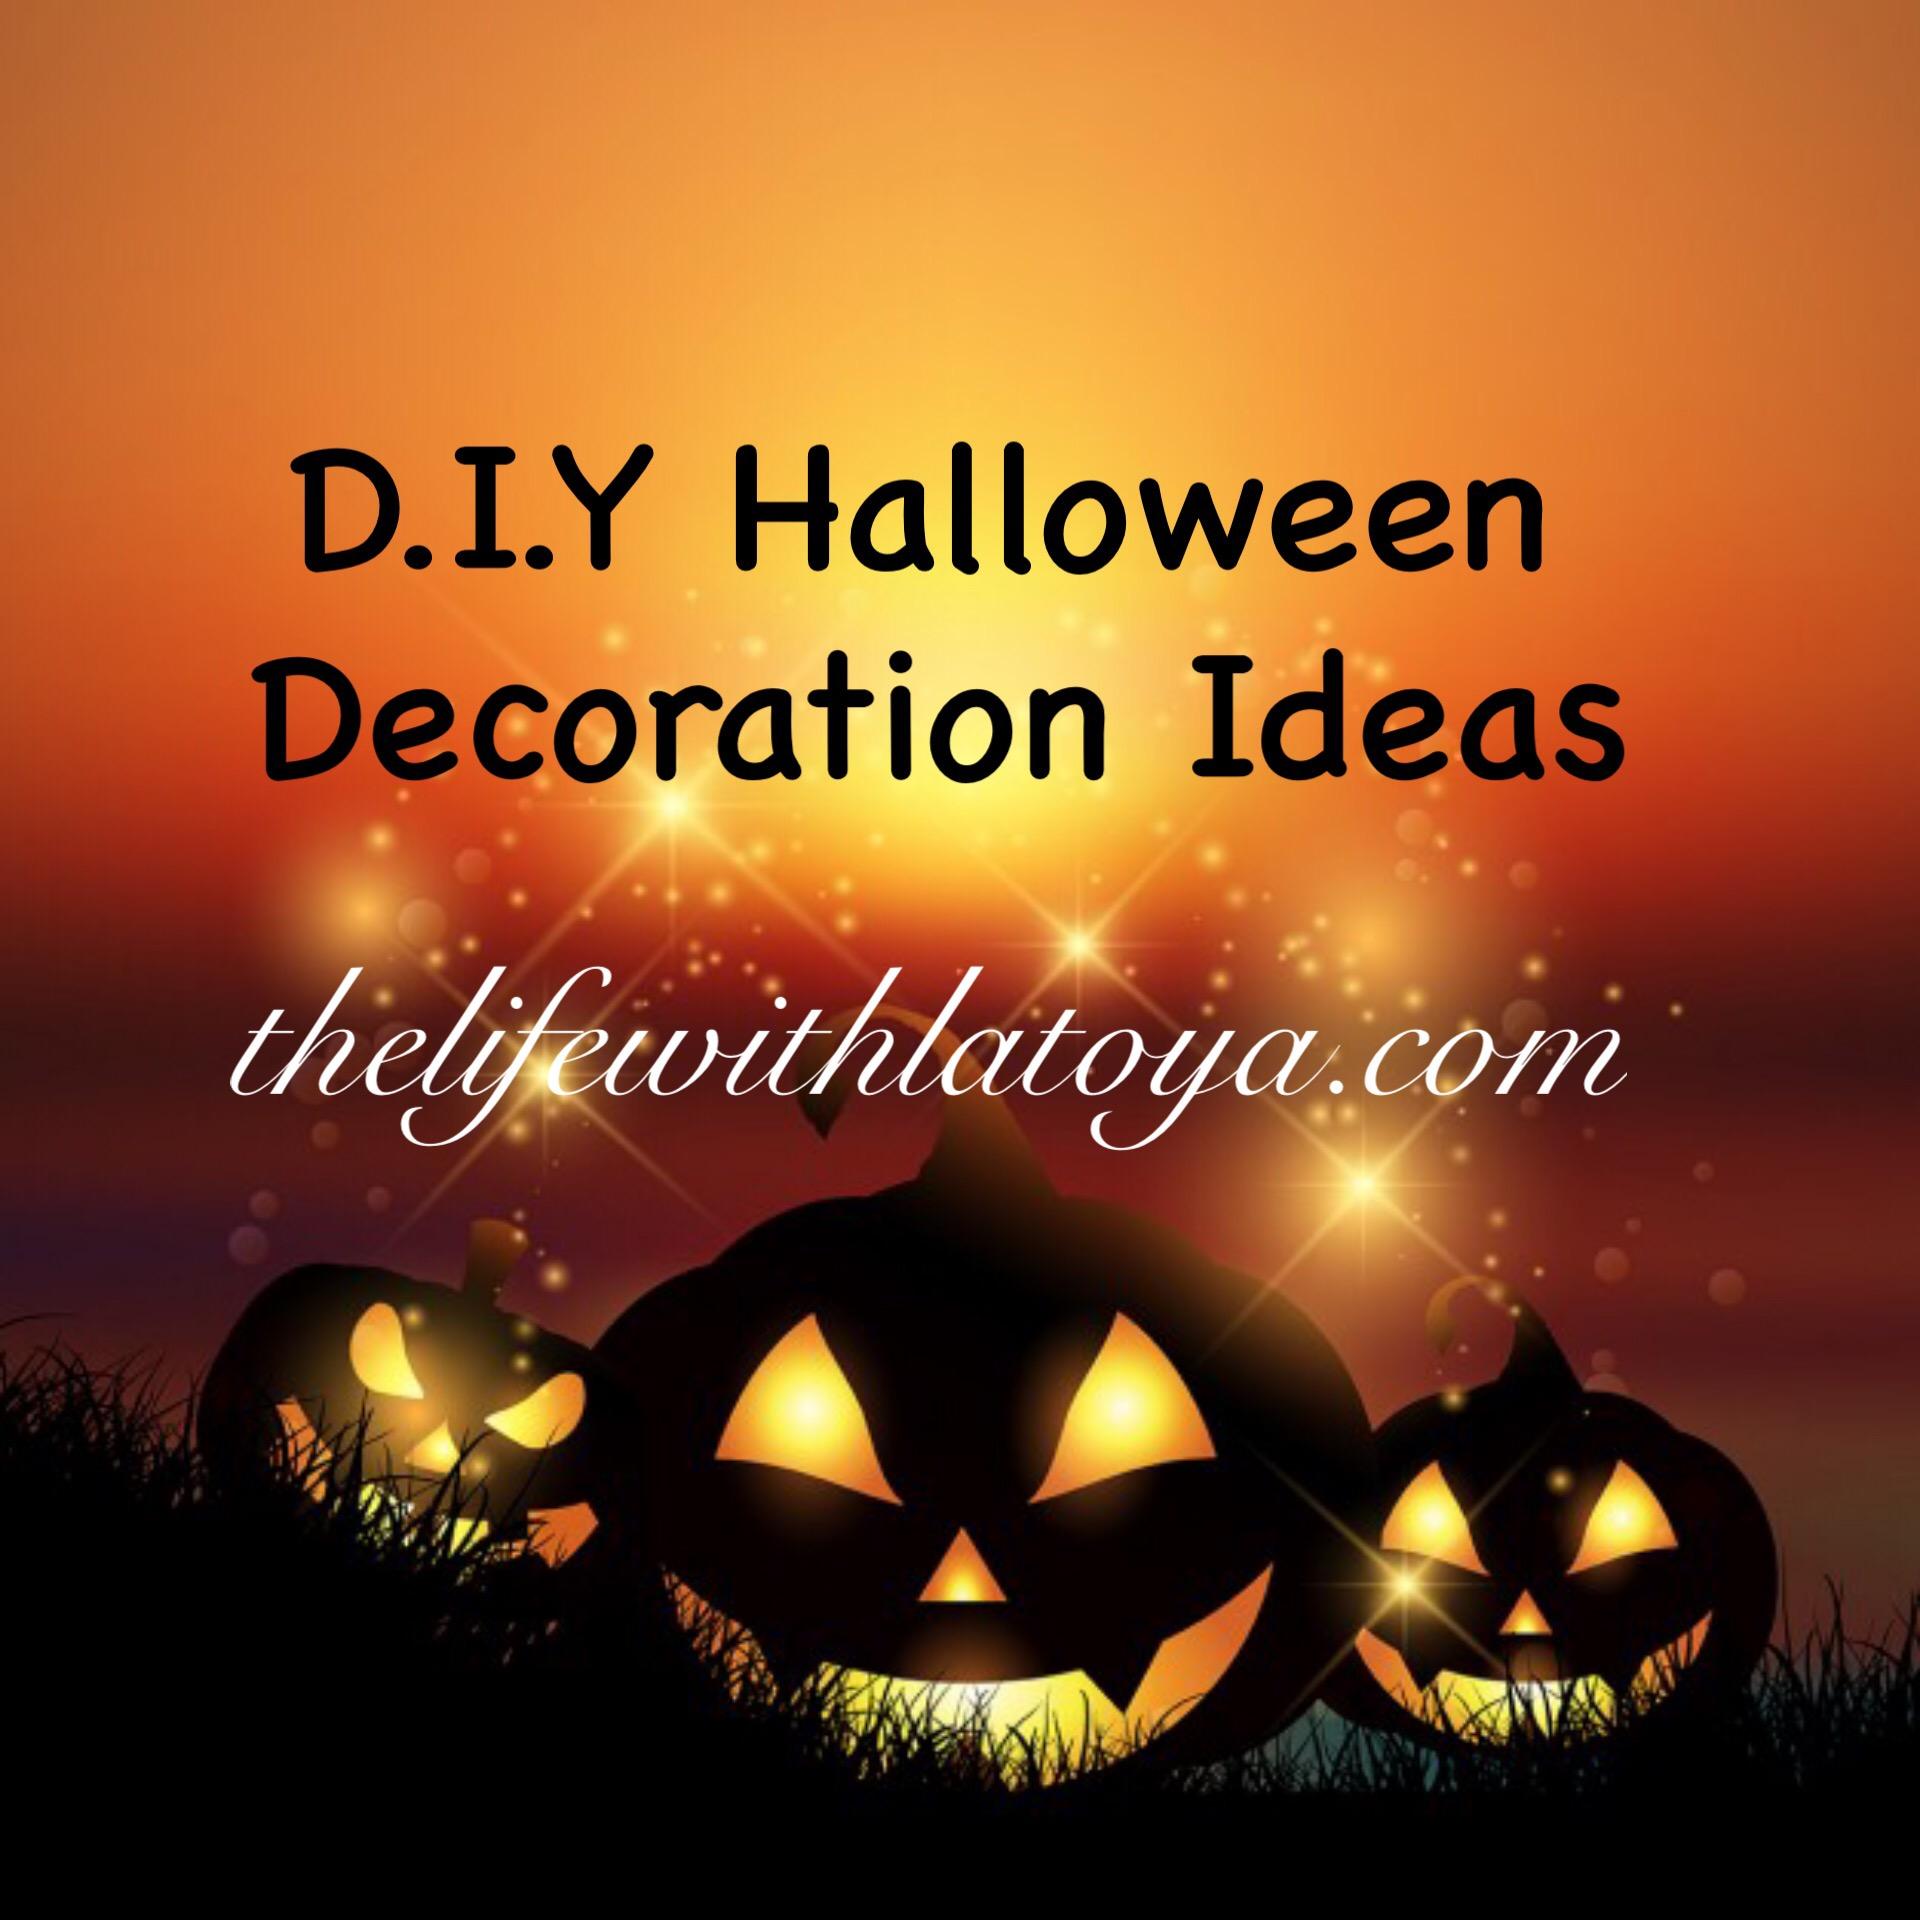 Happy Halloween Tips On Home Decoration 1: D.I.Y Halloween Decoration Ideas